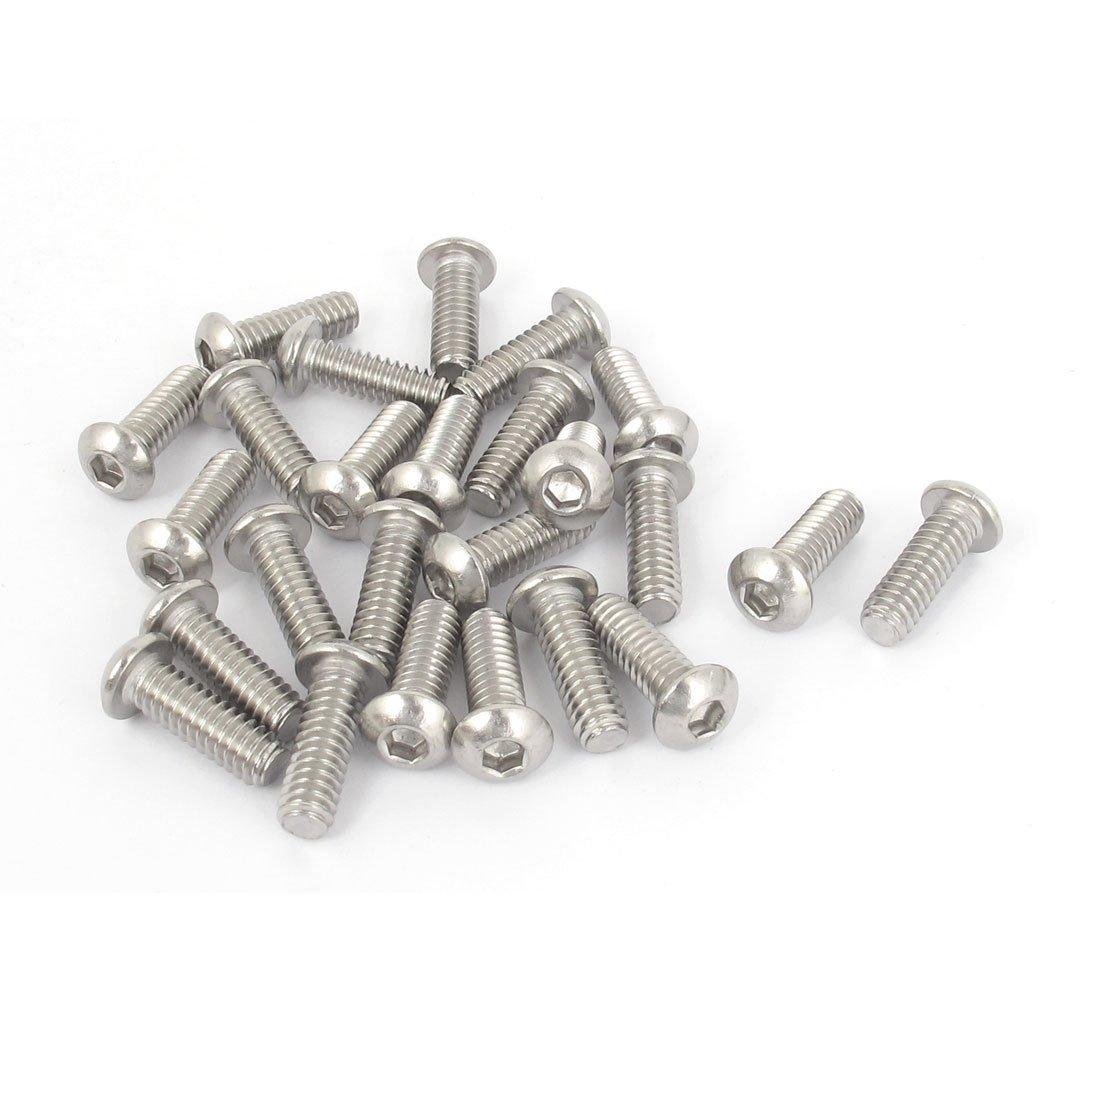 1/4 Inch-20x3/4 Inch Hex Socket Button Head Bolts Screws 25pcs 20pcs m3 6 m3 x 6mm aluminum anodized hex socket button head screw